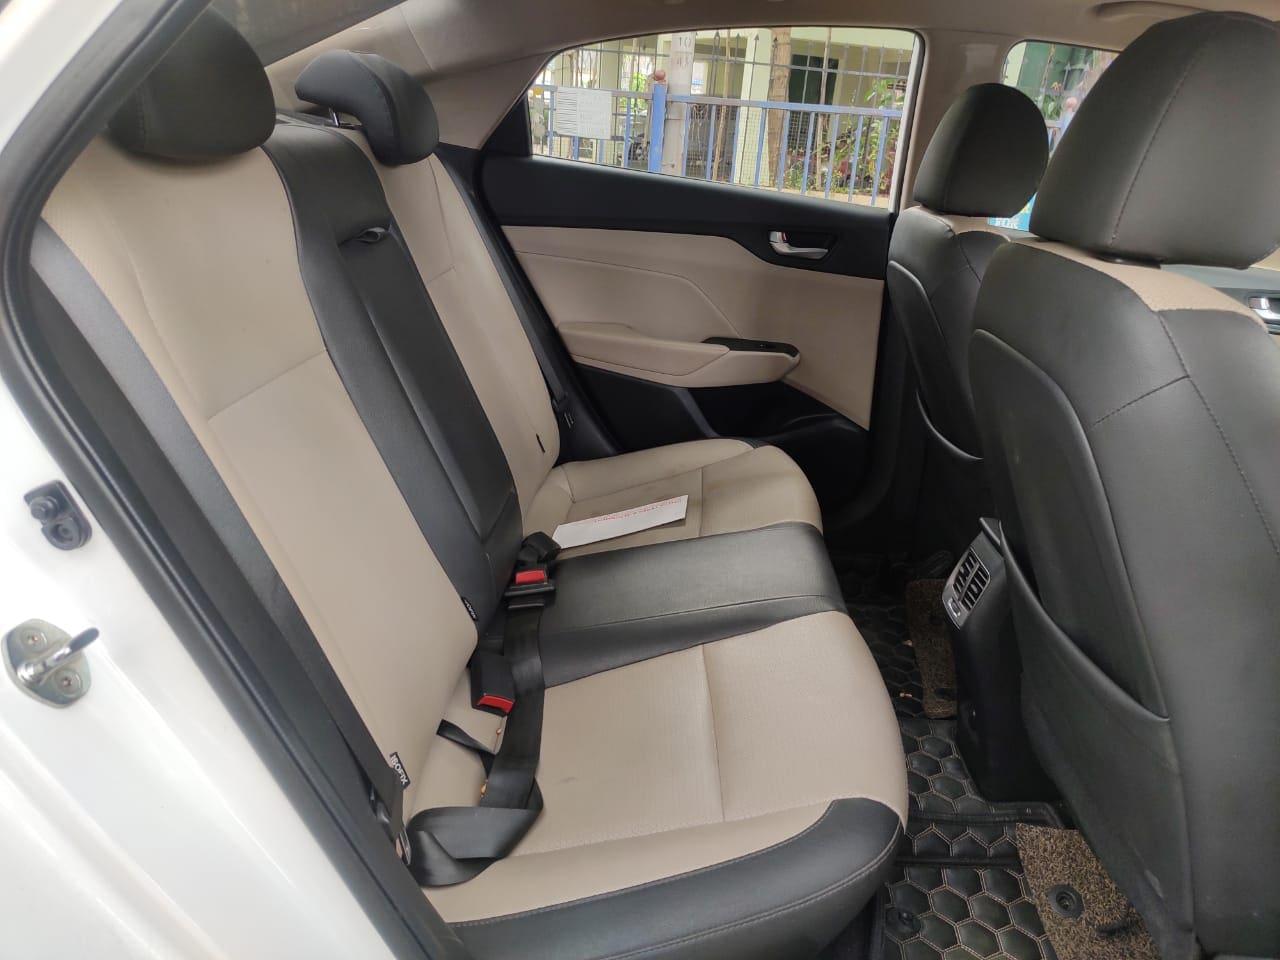 Hyundai Verna 2017-2020 CRDi 1.6 AT SX Option